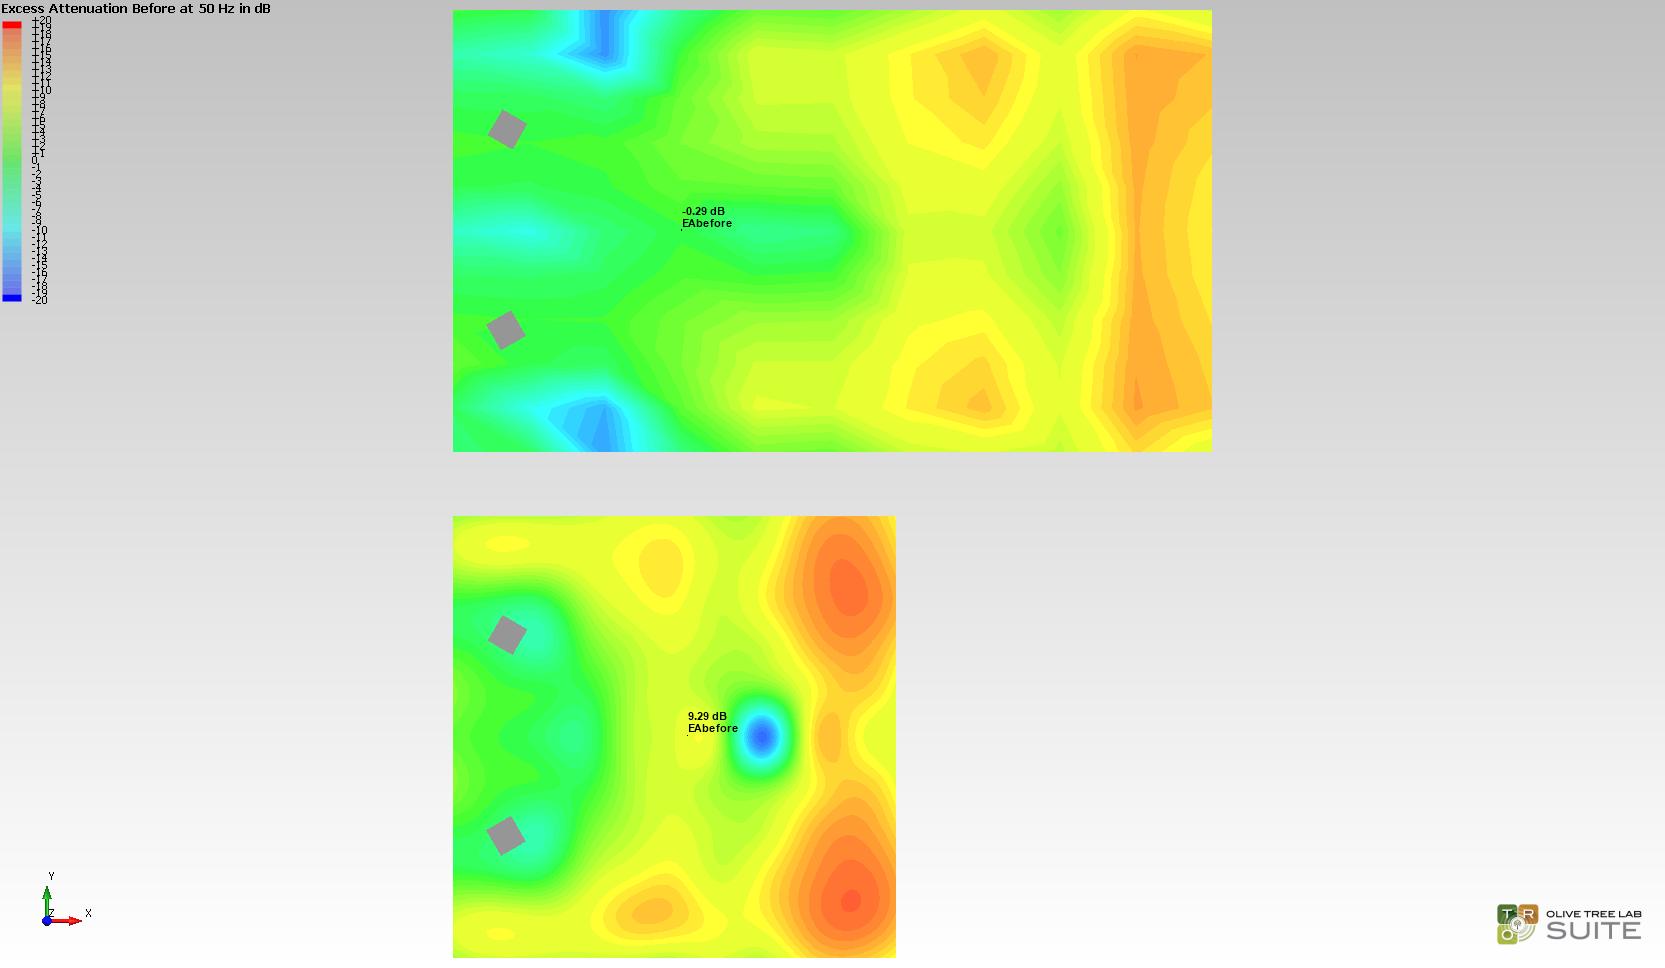 Olive Tree Lab Software: Acoustic Computational Analysis